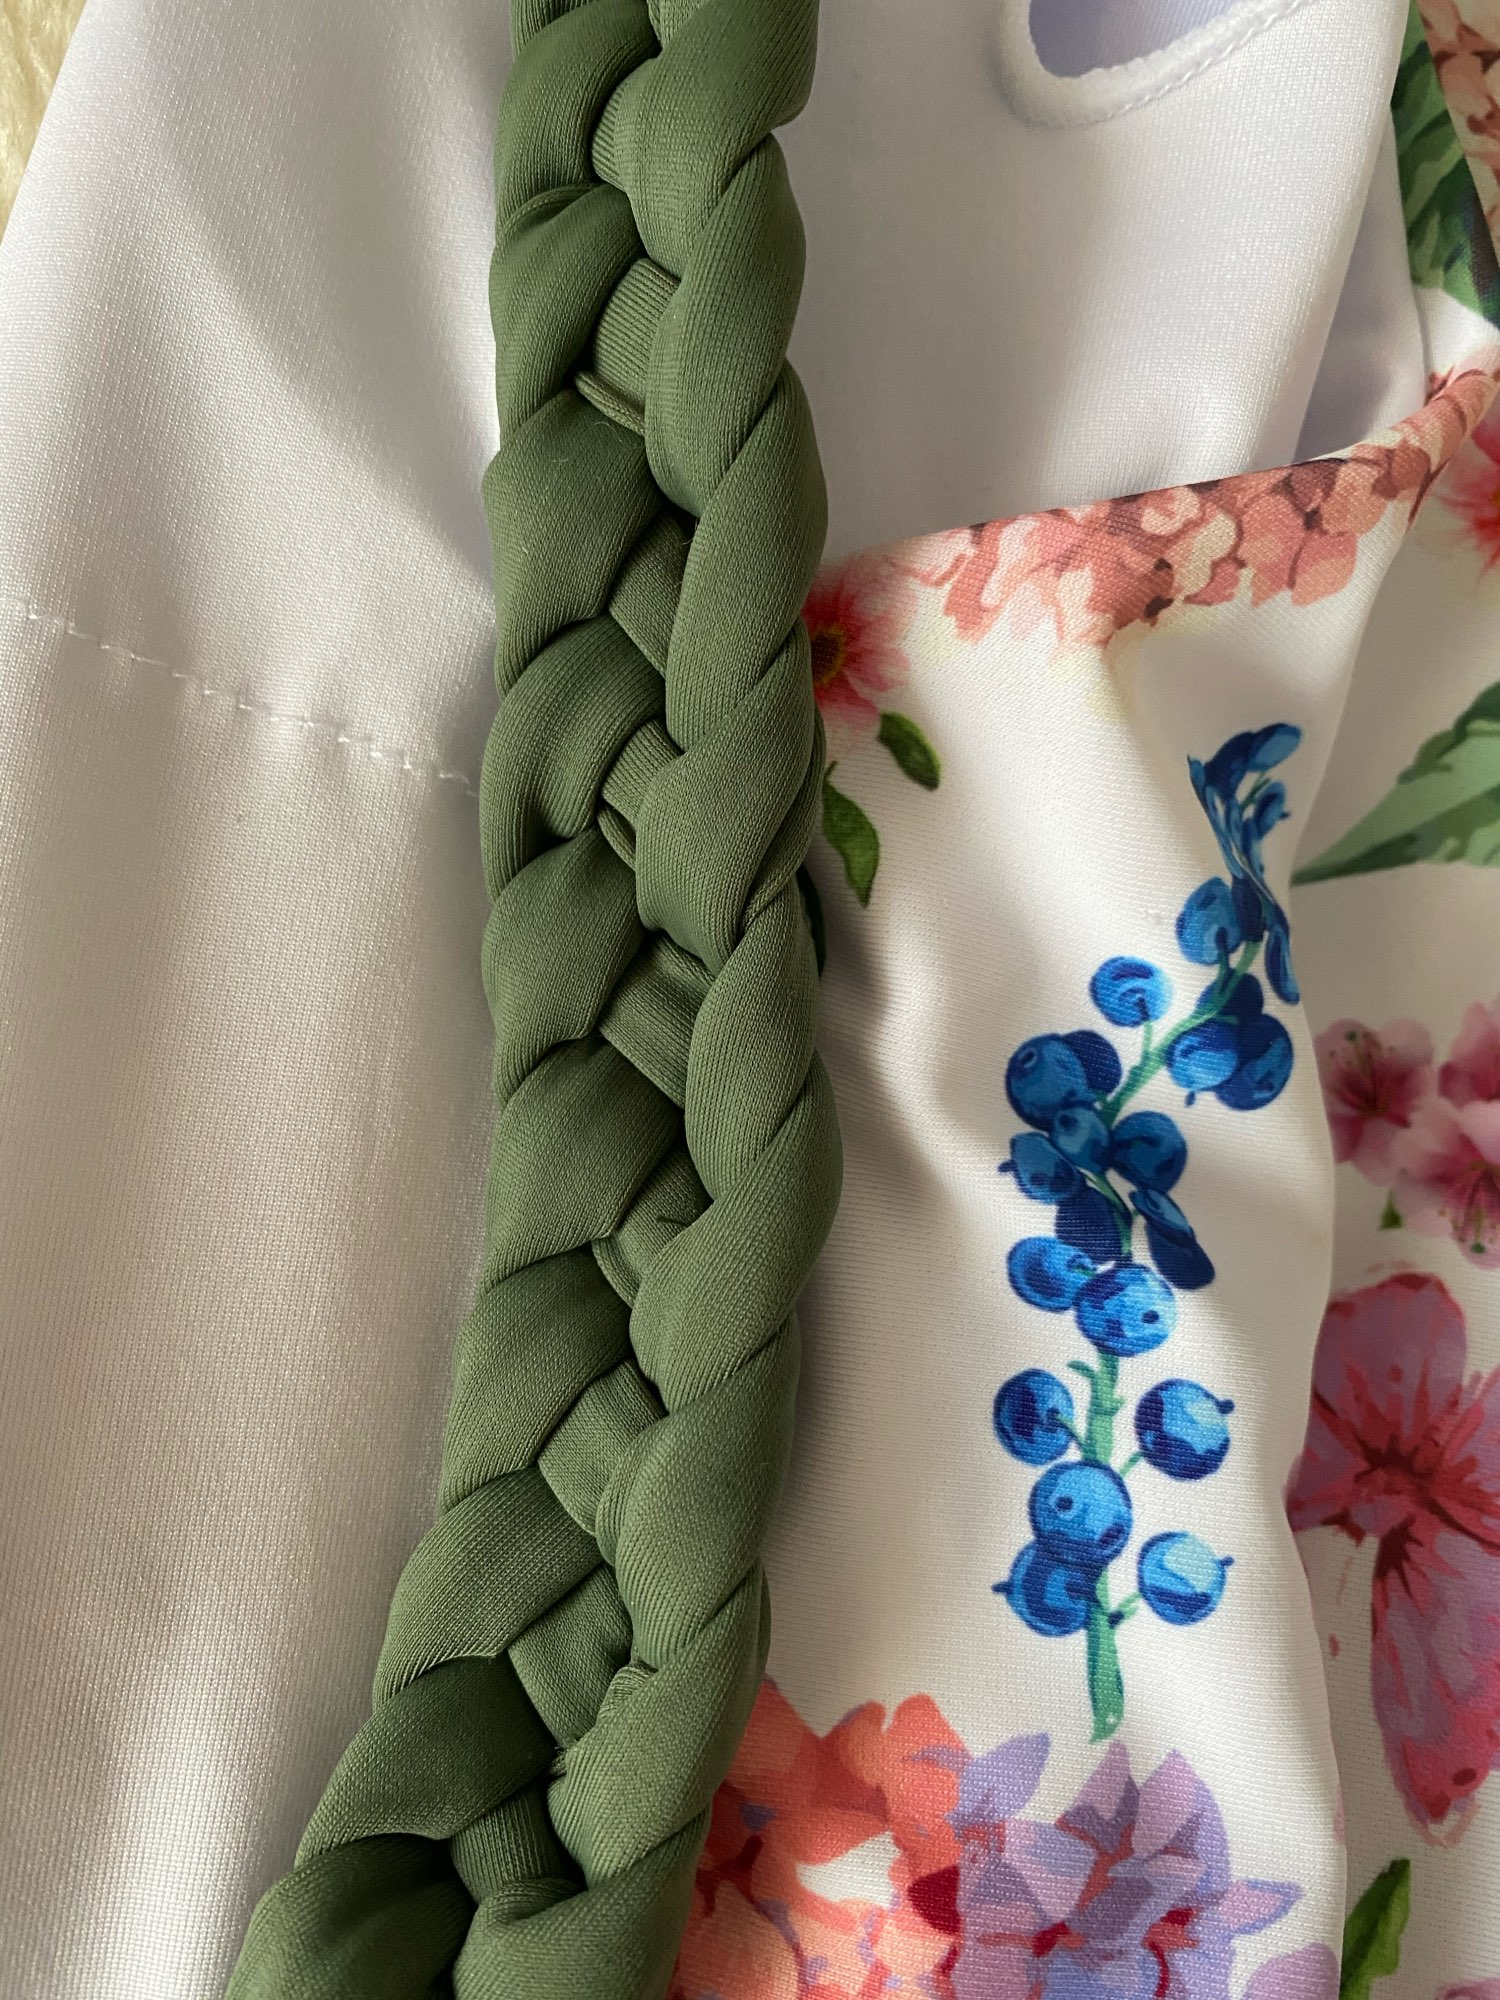 Miyouj 2021 Braided shoulder strap Swimsuit Women'S Beach Elegant Hollow Out Swimwear Women Multi Line Fresh Blue One Piece Suit Body Suits    - AliExpress